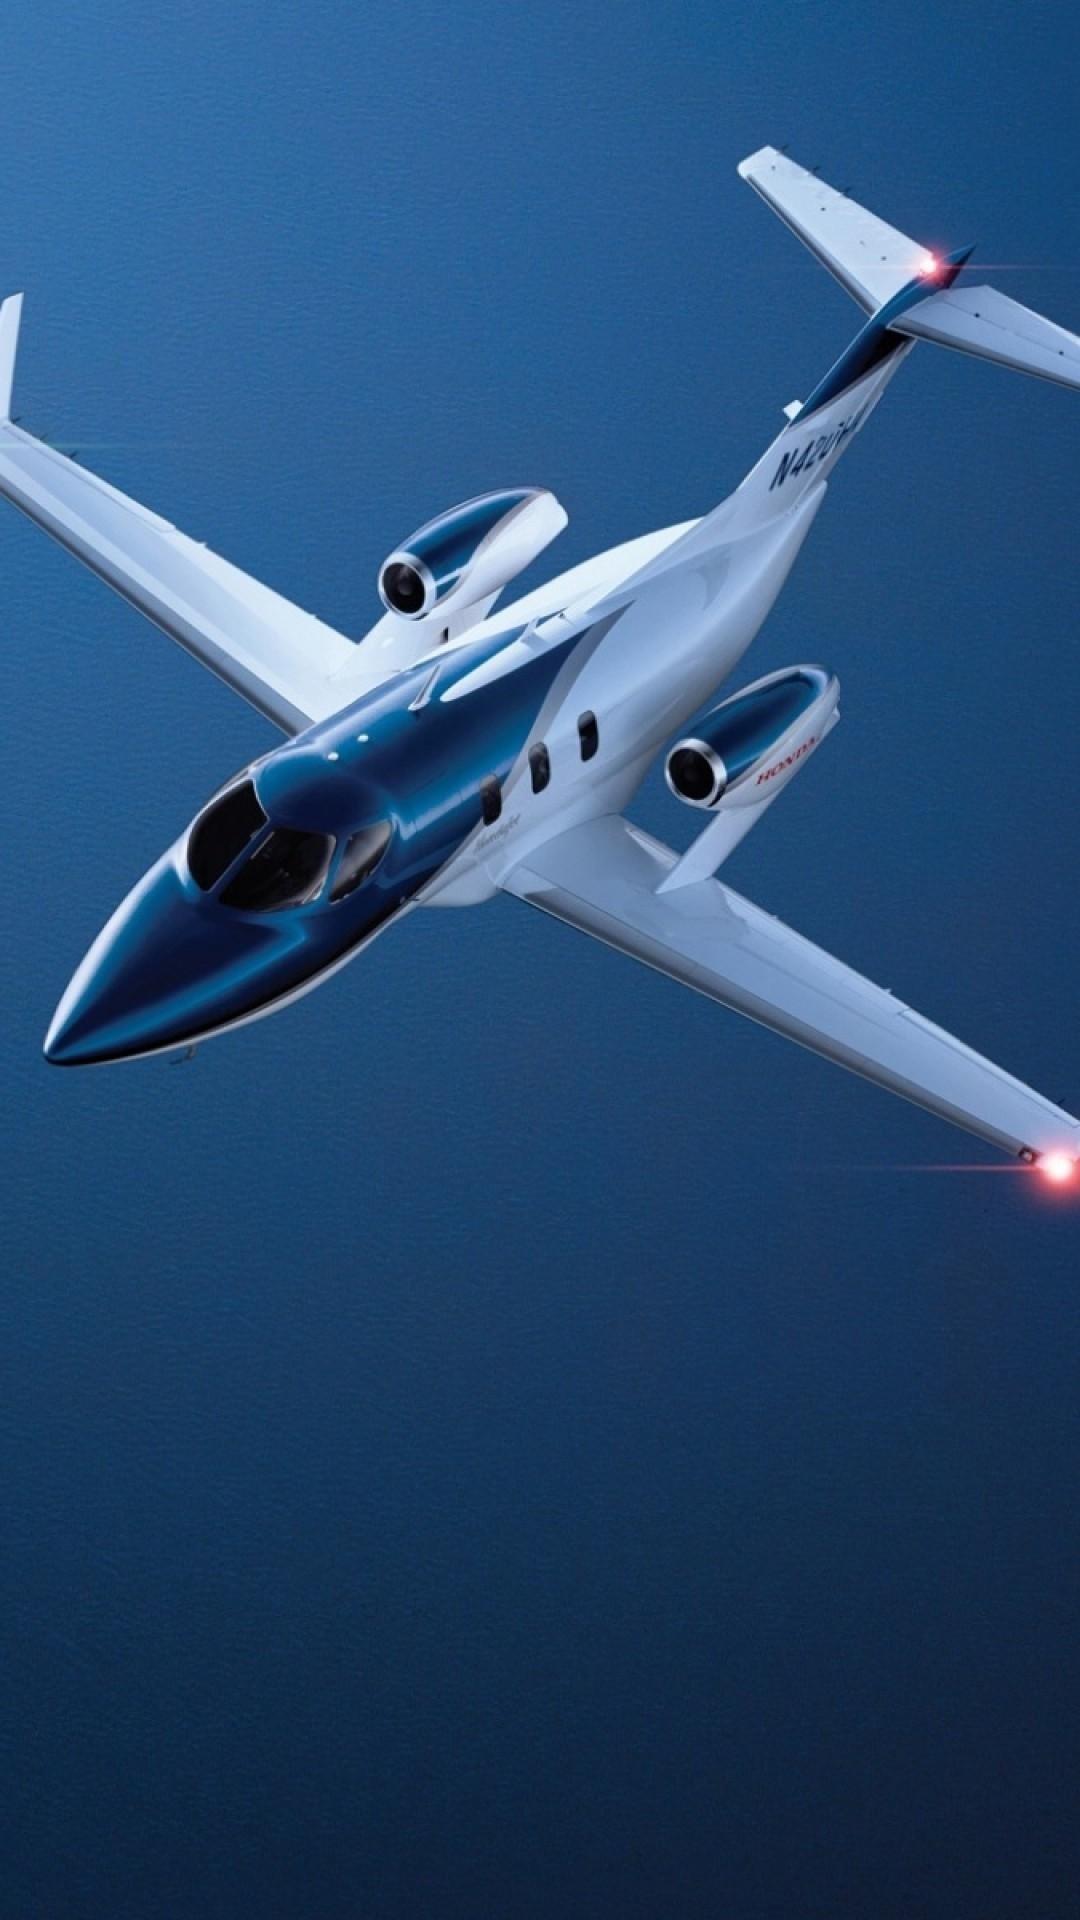 Private jet wallpapers wallpapertag - Jet wallpaper ...